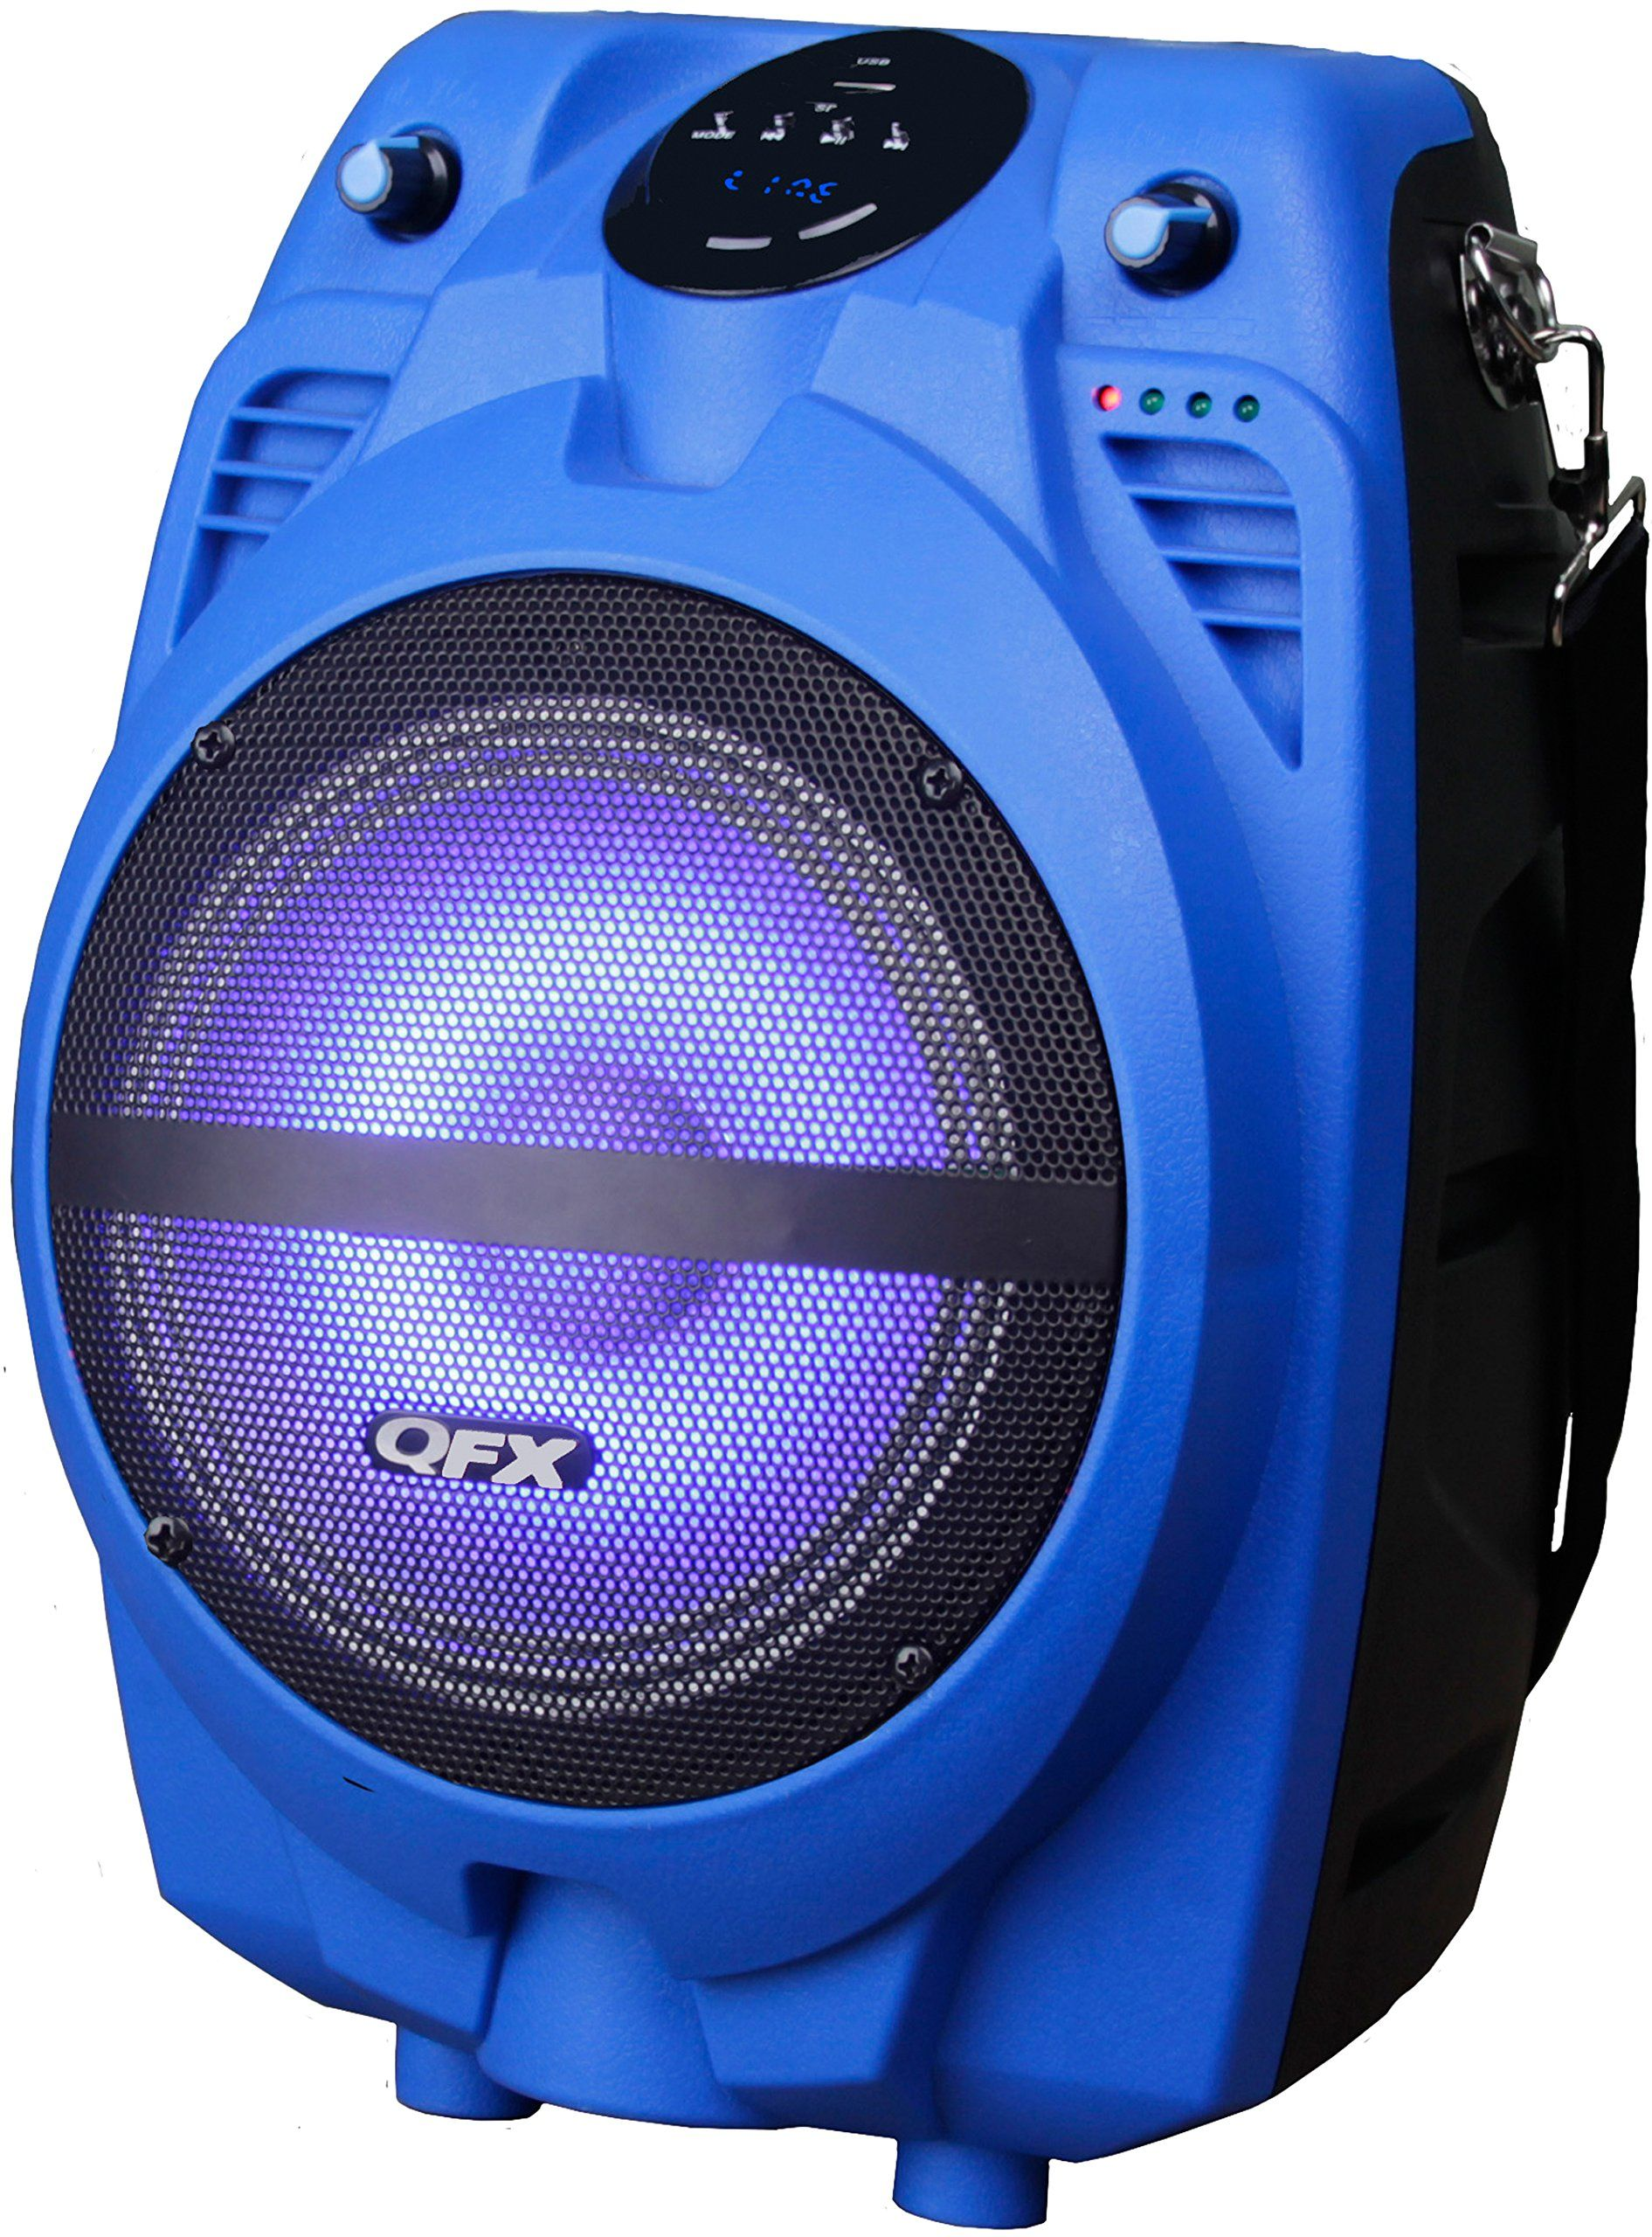 Moonlight Speakers qfx pbx-710700btl-bl portable bluetooth party speaker, blue. fm